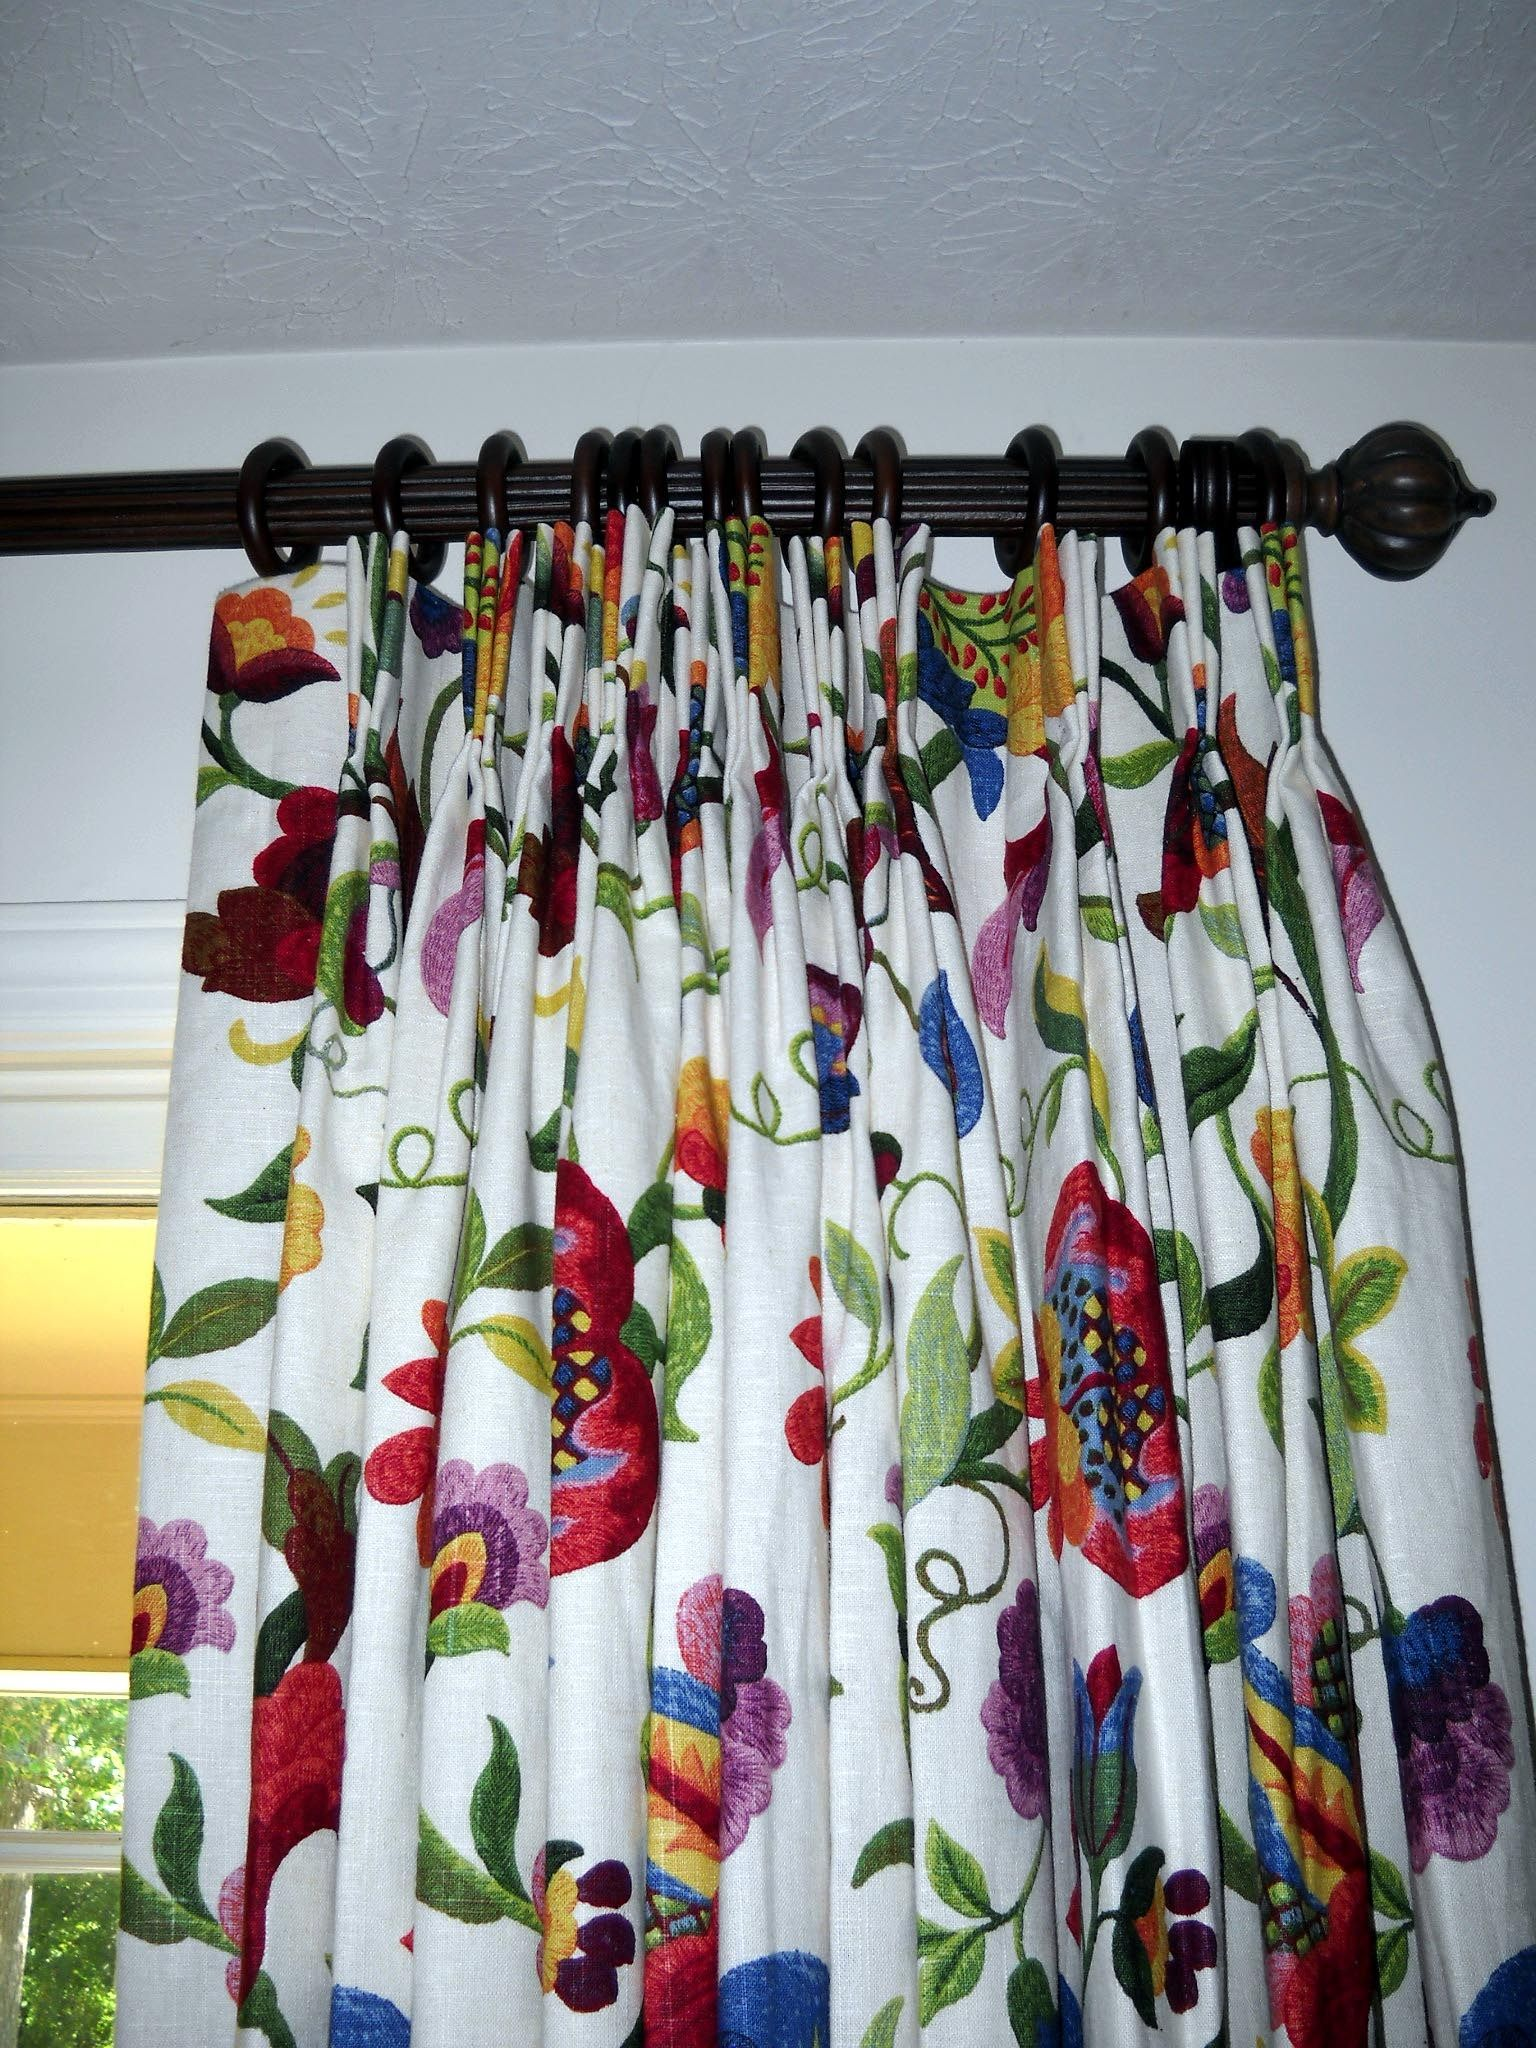 Vines and vibrant colors Linen Curtain,Drapes Custom made draperies Window panels Curtains Designer Fabric Custom curtains Green Blue